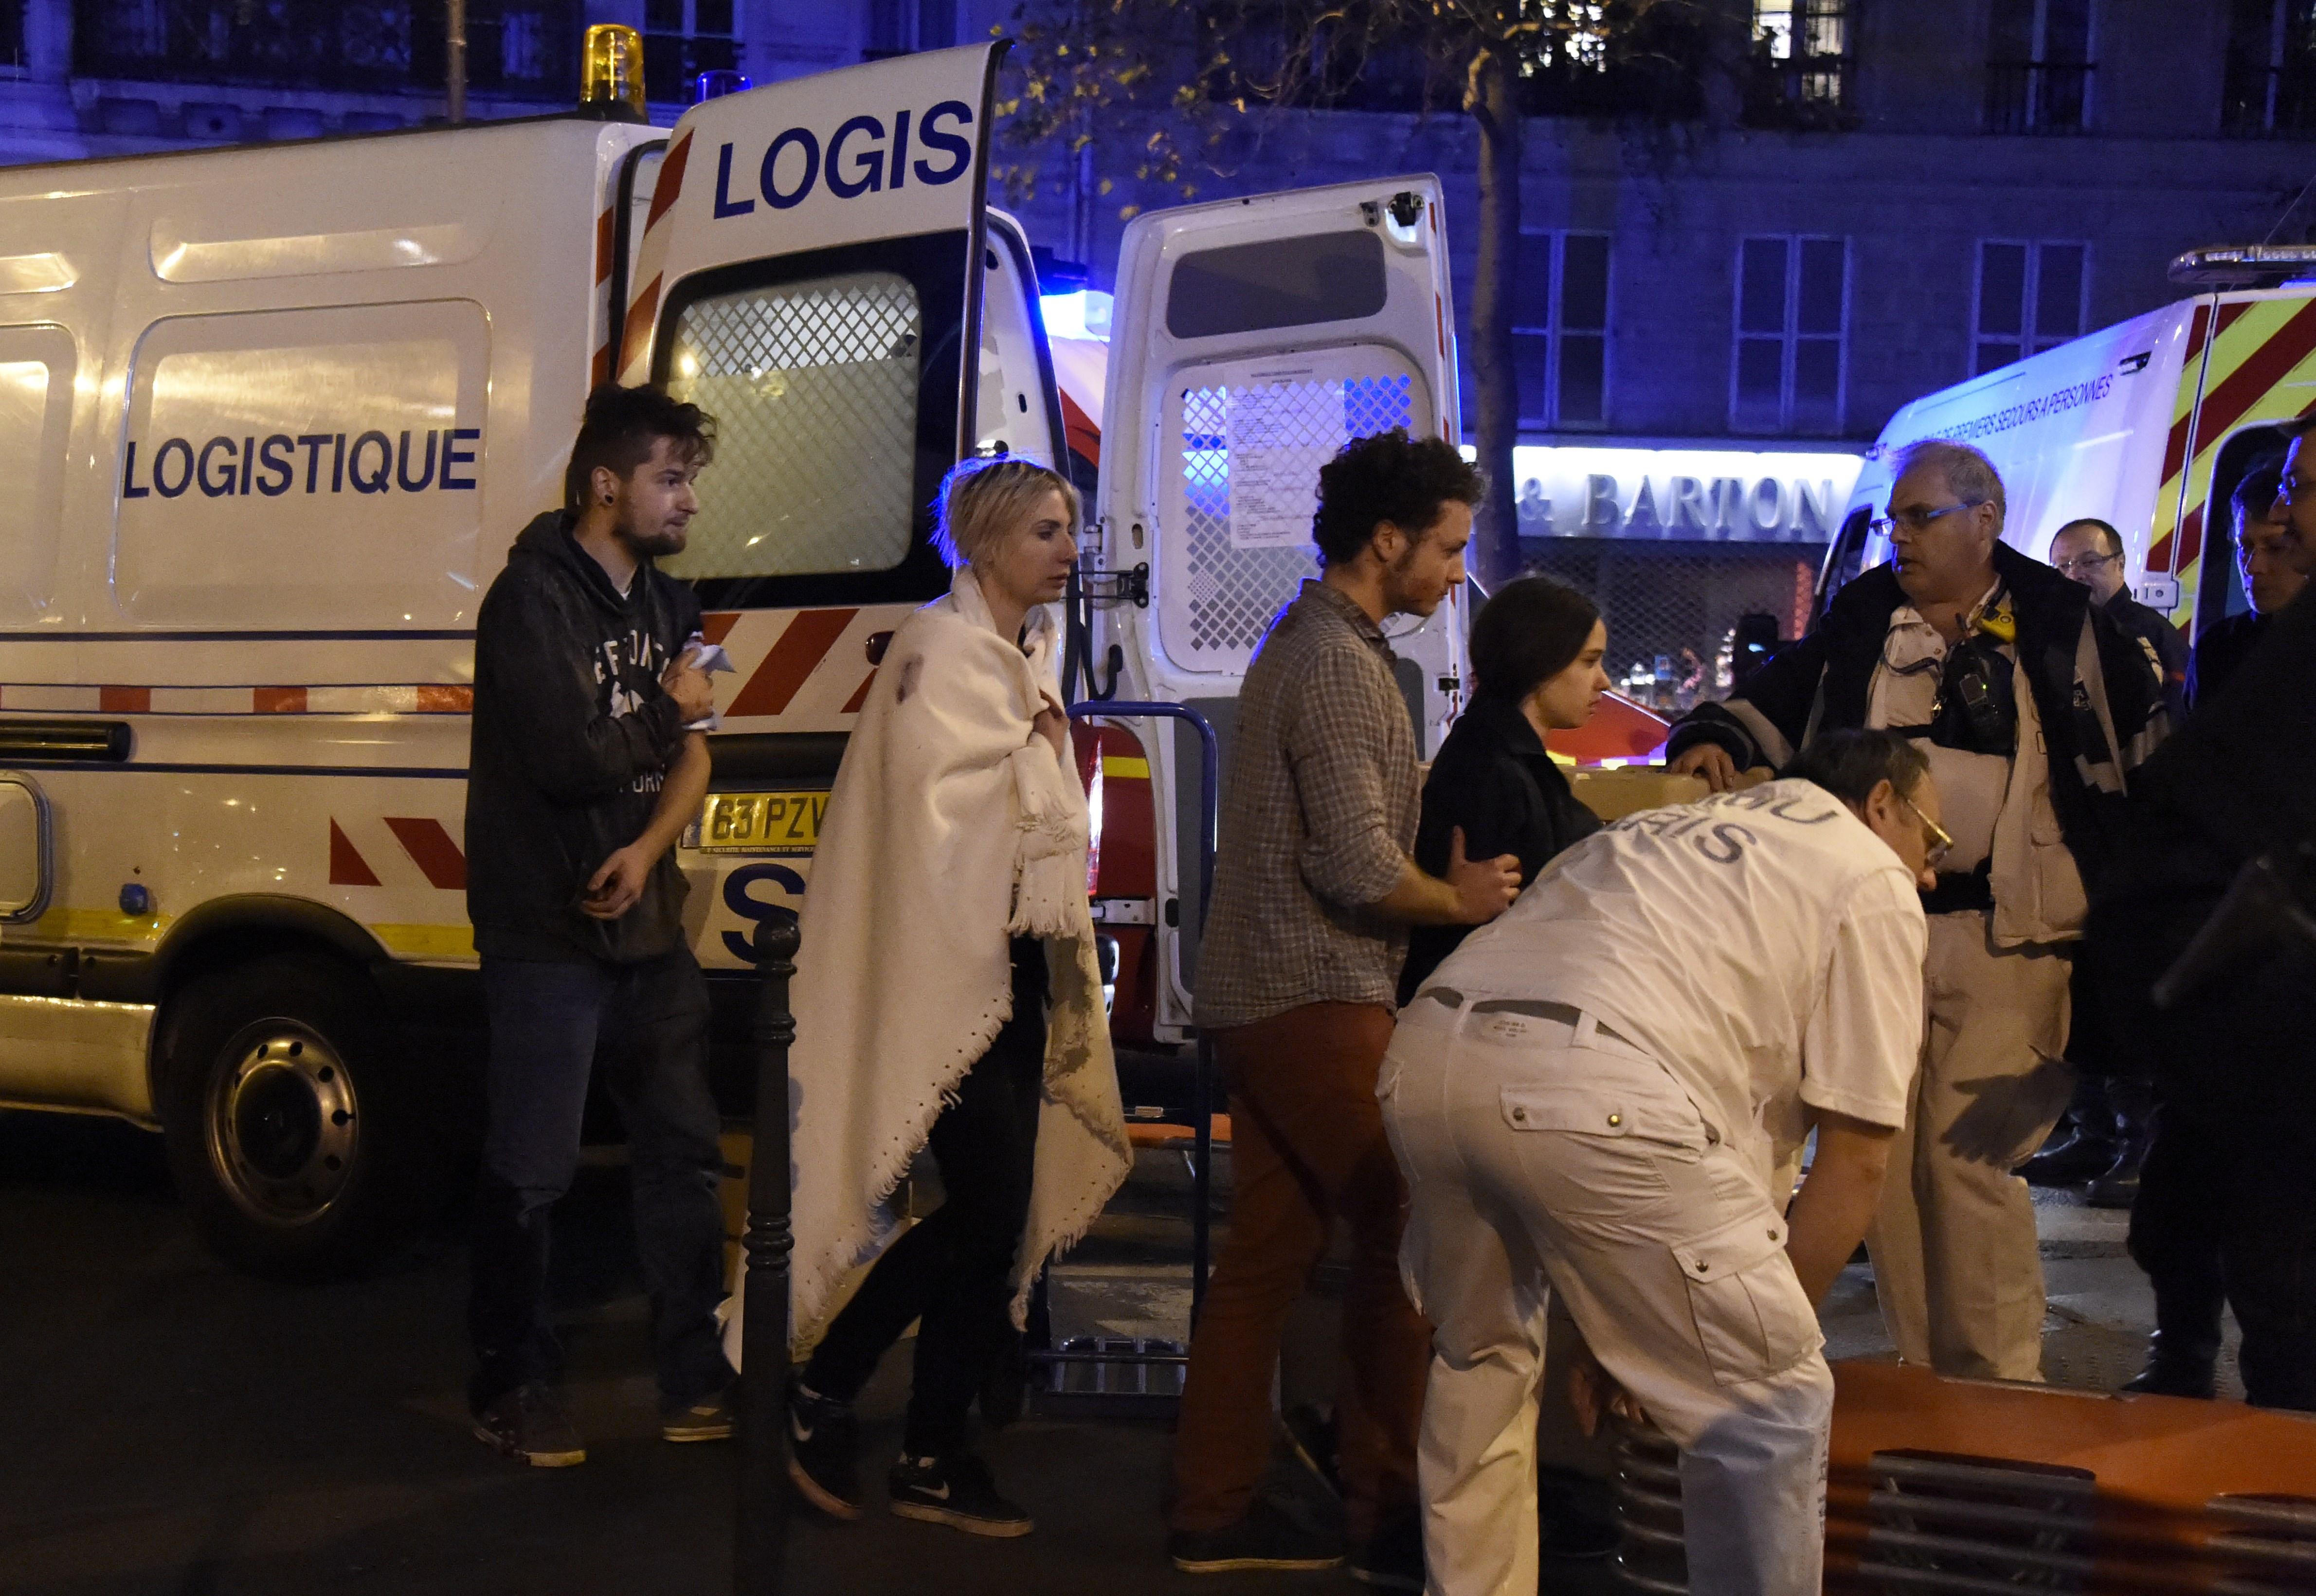 Nearly 100 Dead After Paris Concert Terrorist Attack